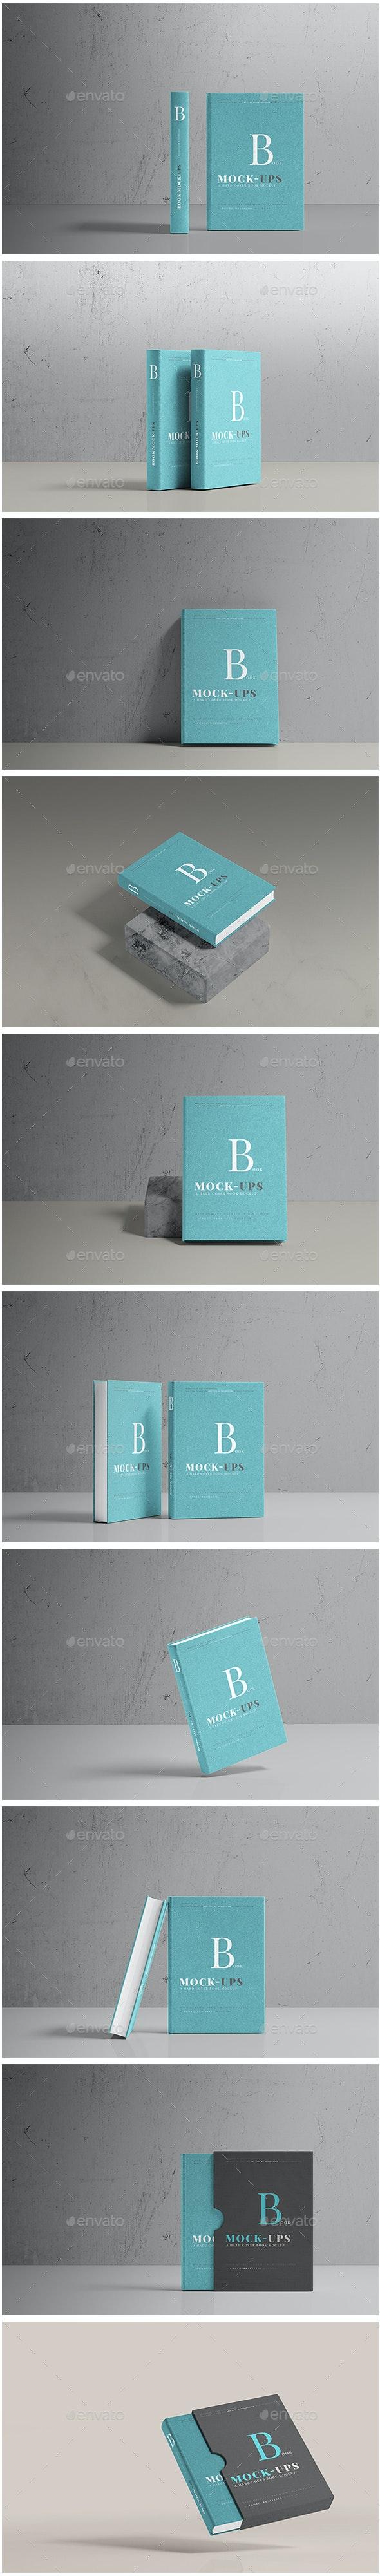 Hard Cover Book Mockup - Books Print